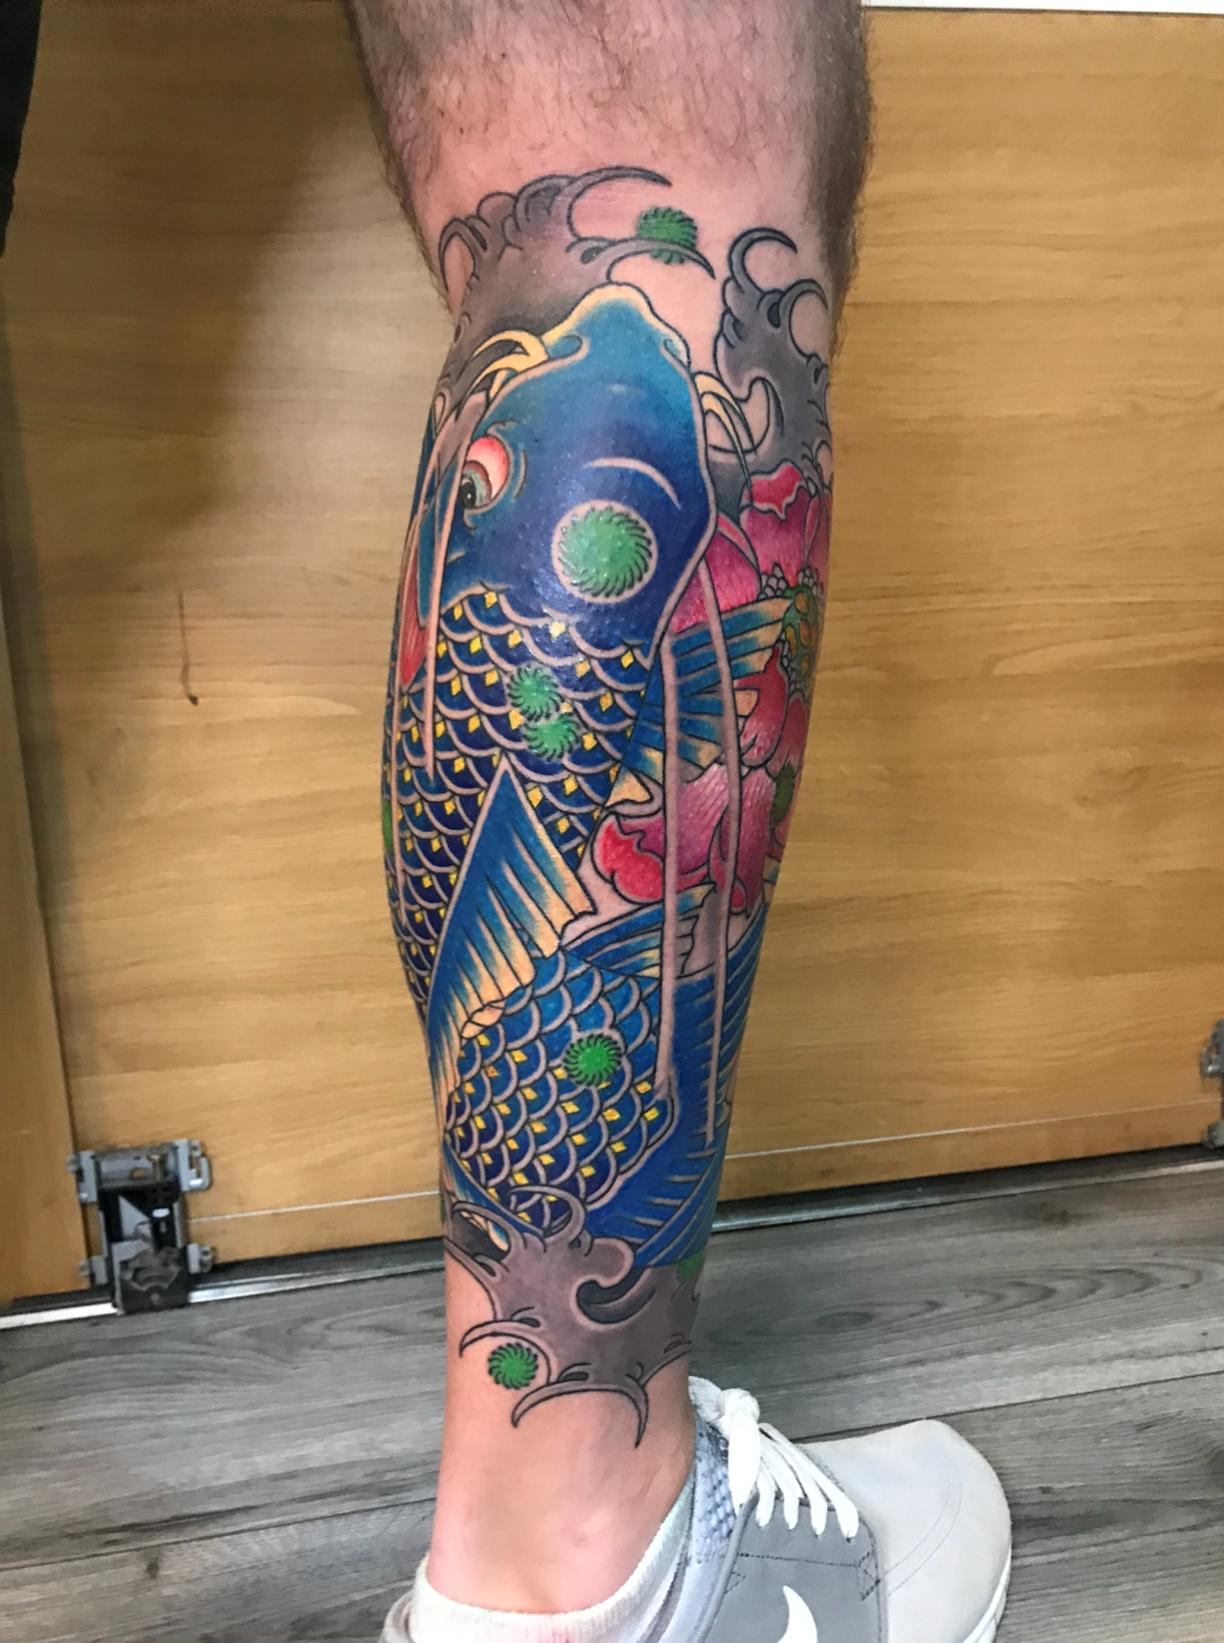 Inksearch tattoo Mateusz Kanu